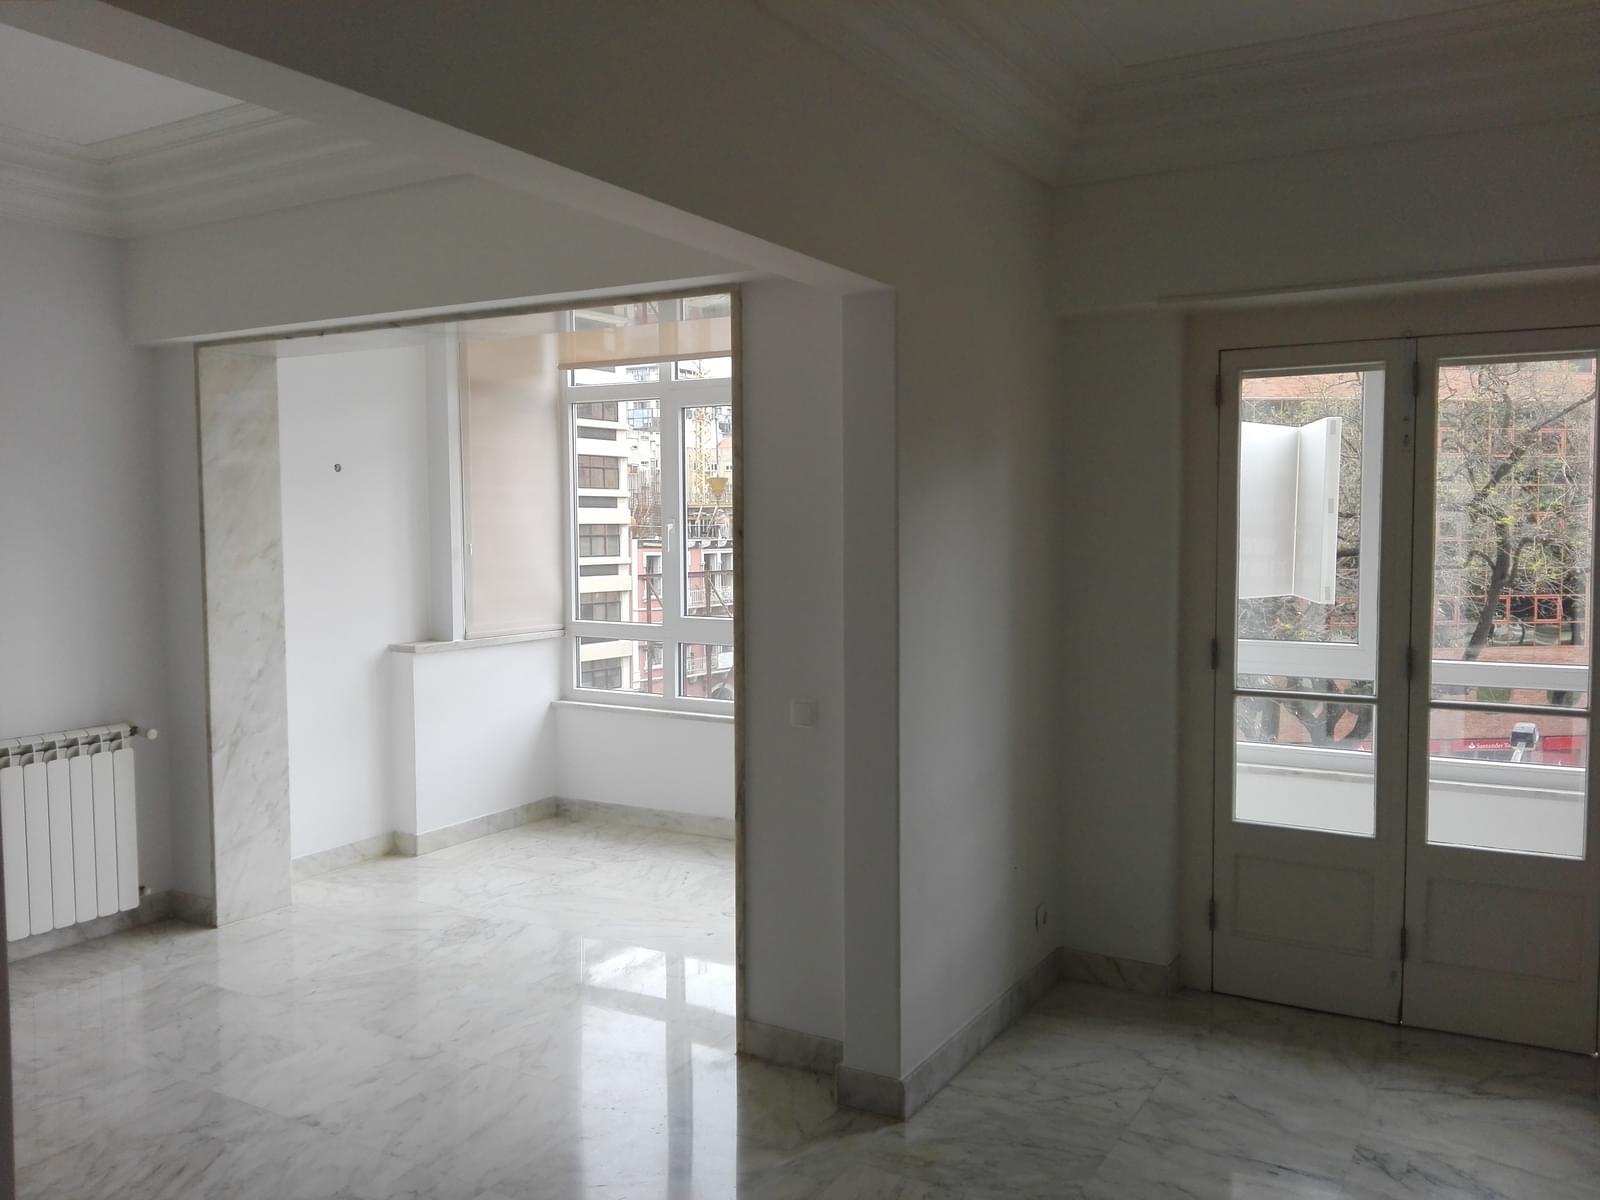 pf17056-apartamento-t4-1-lisboa-a701b401-e76a-41ba-a968-042a2b762905